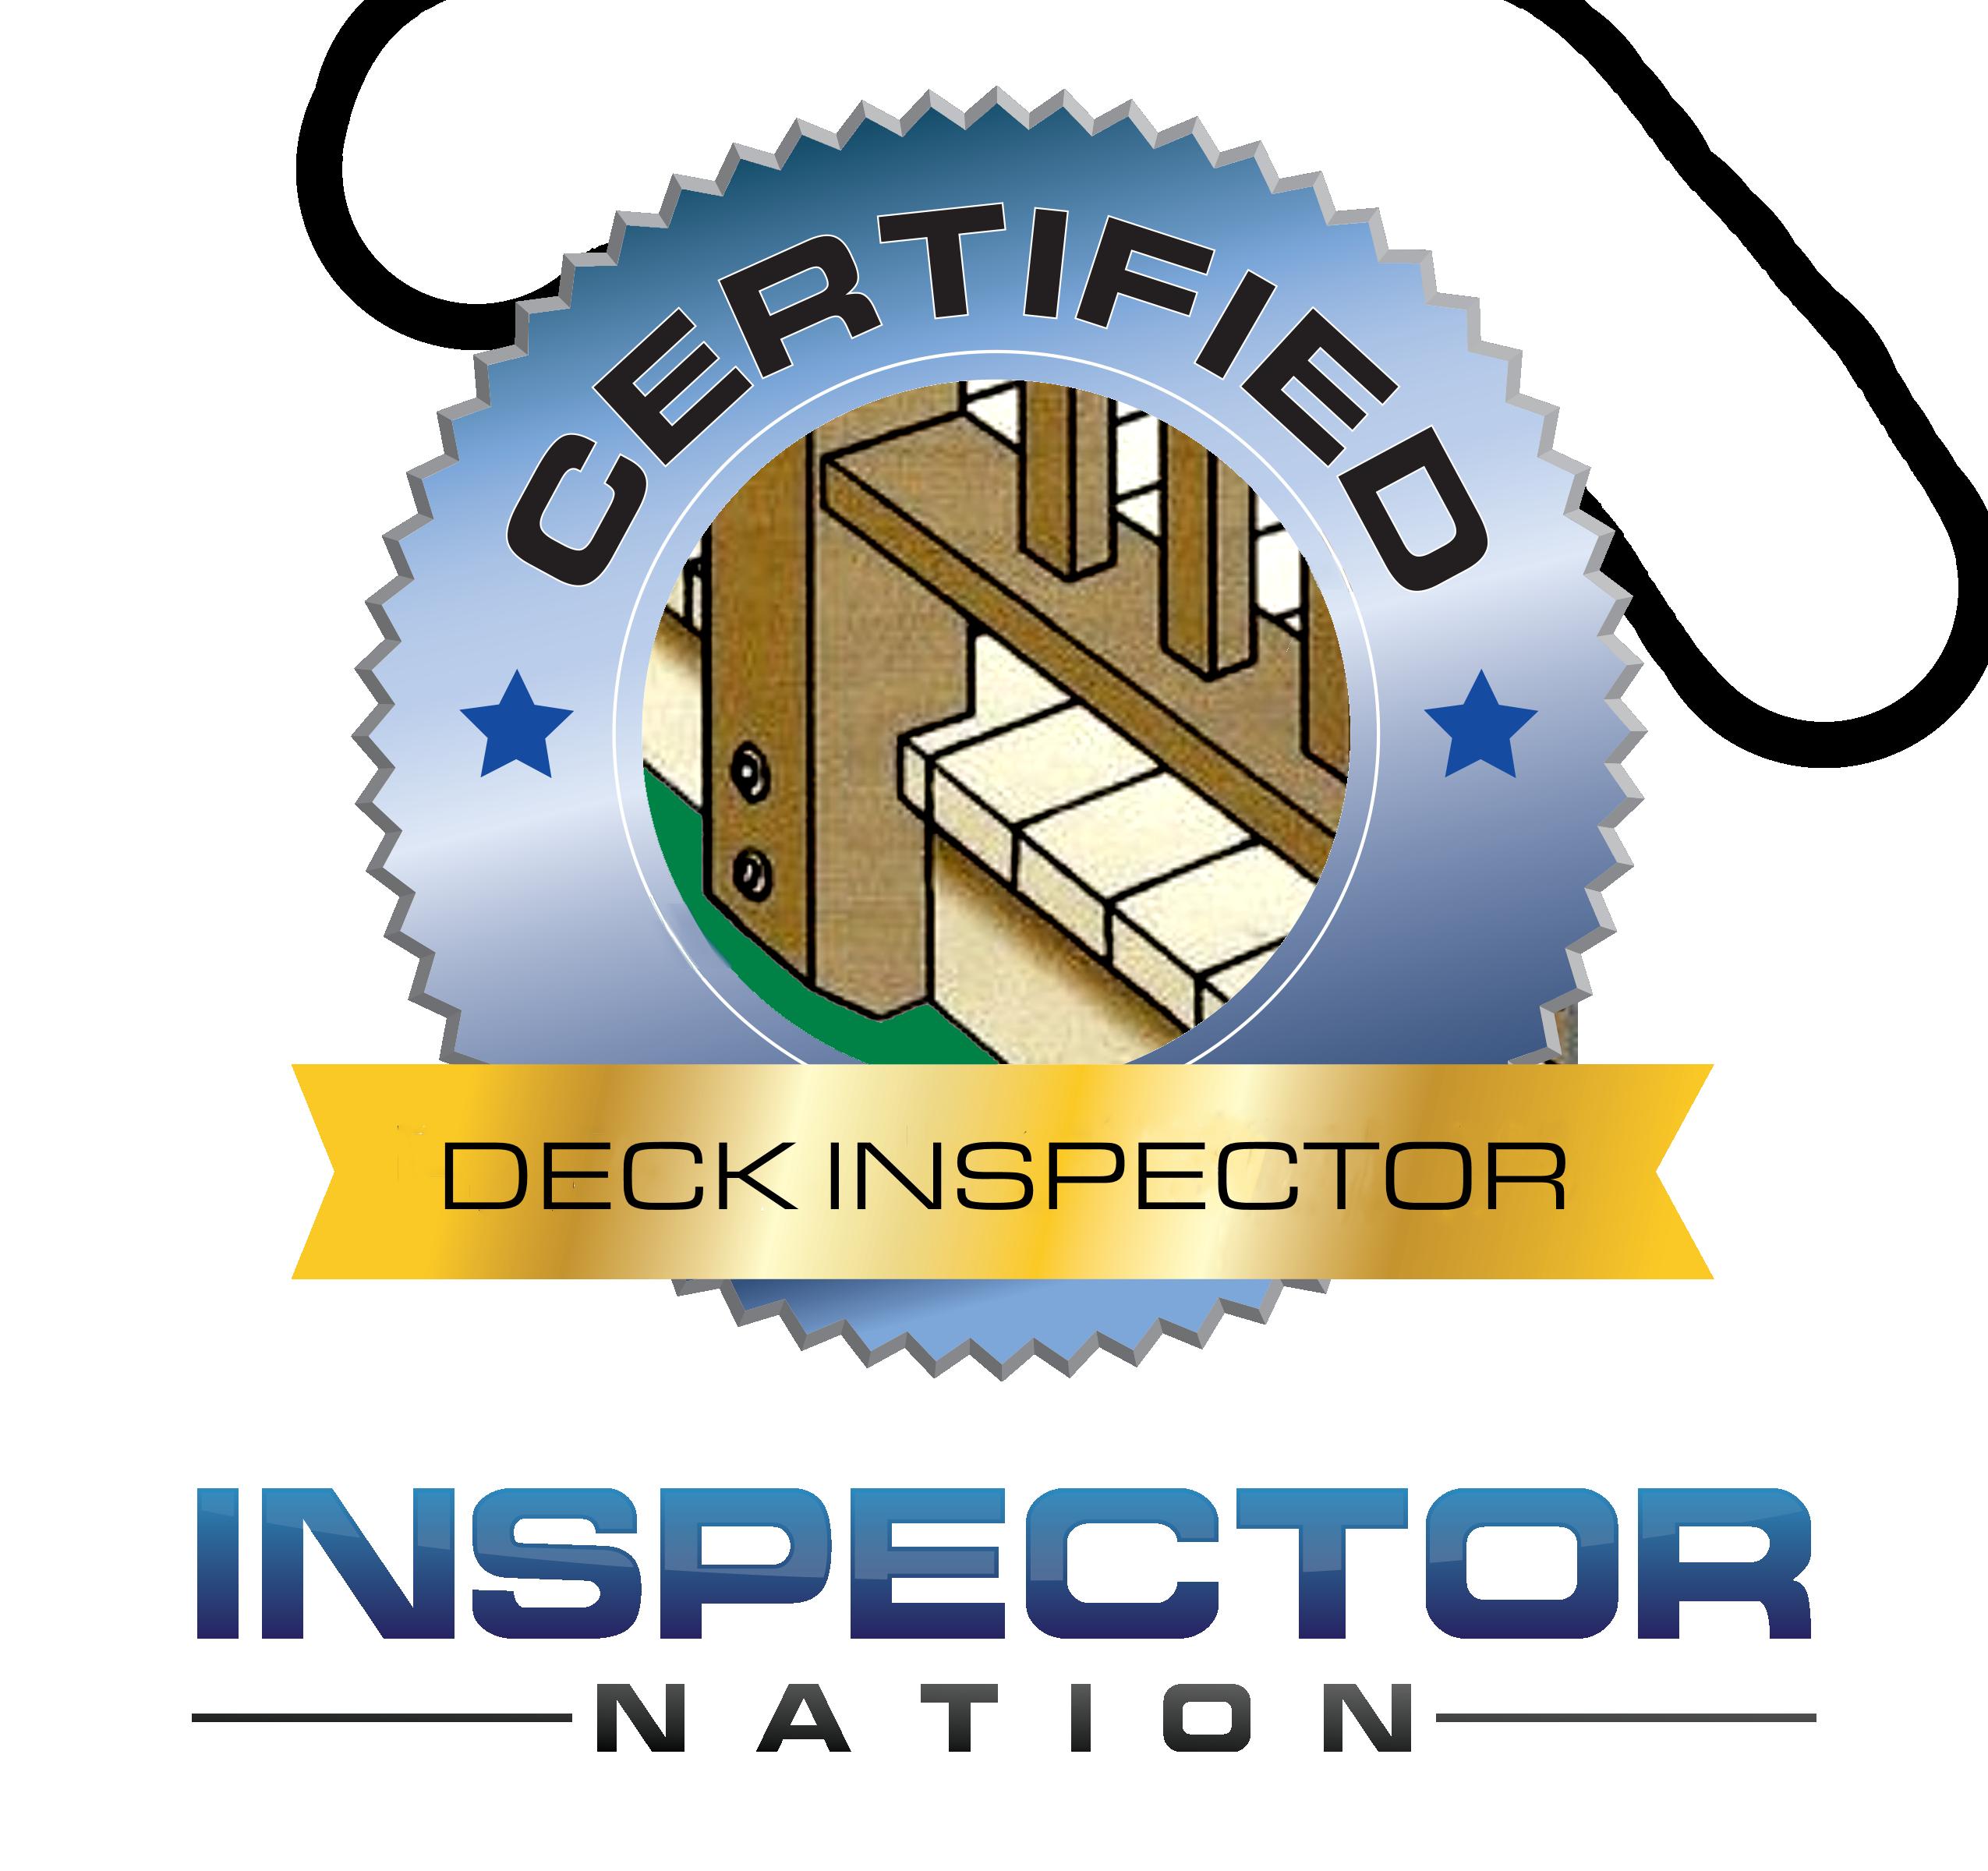 deck inspector inspector nation certified home inspector badge emblem icon